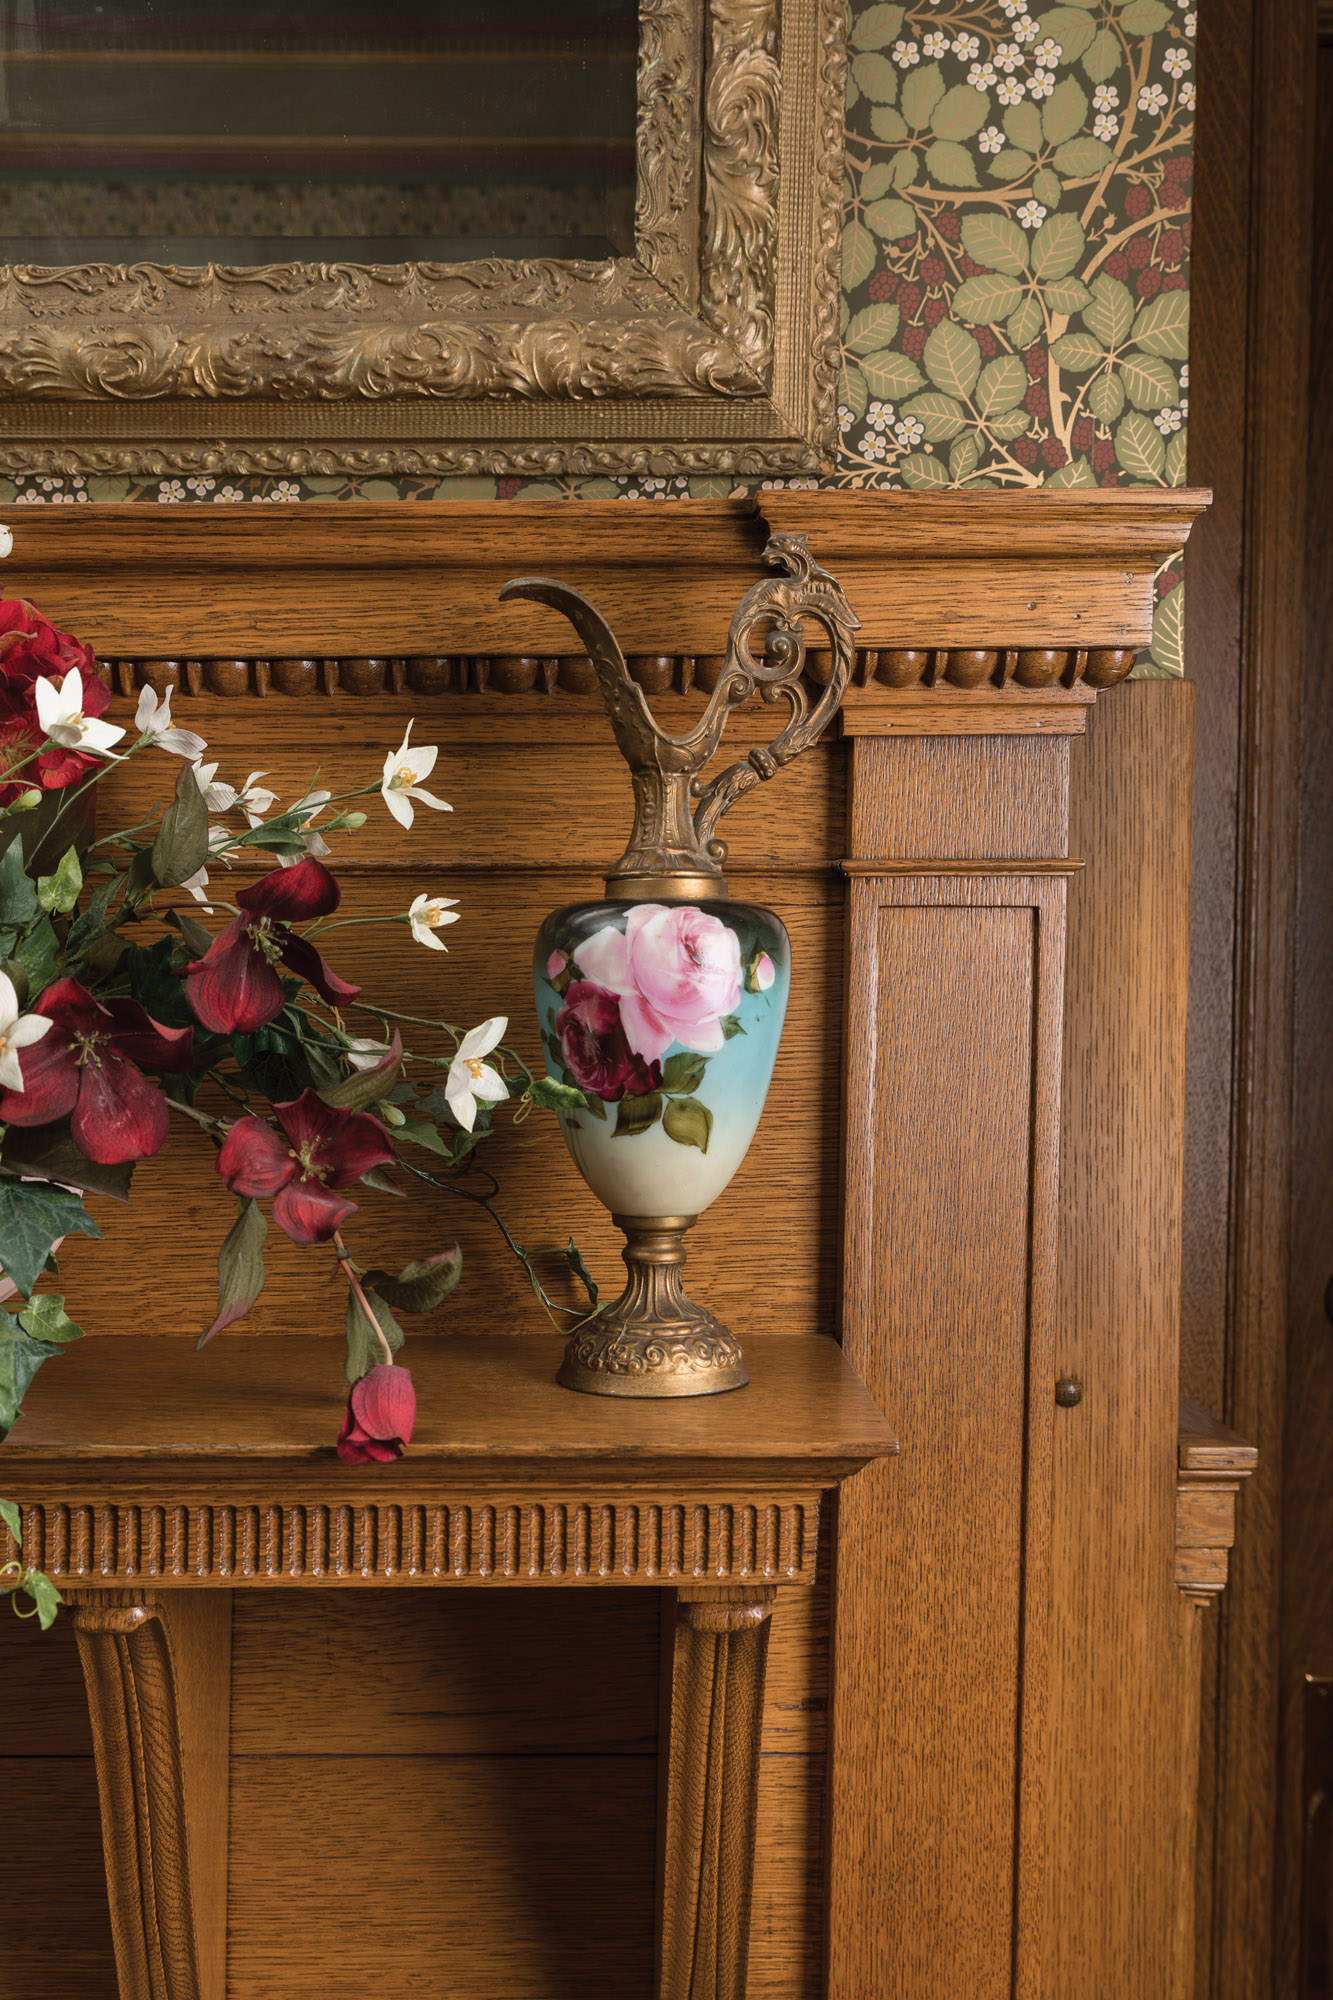 oak woodwork, Victorian woodwork